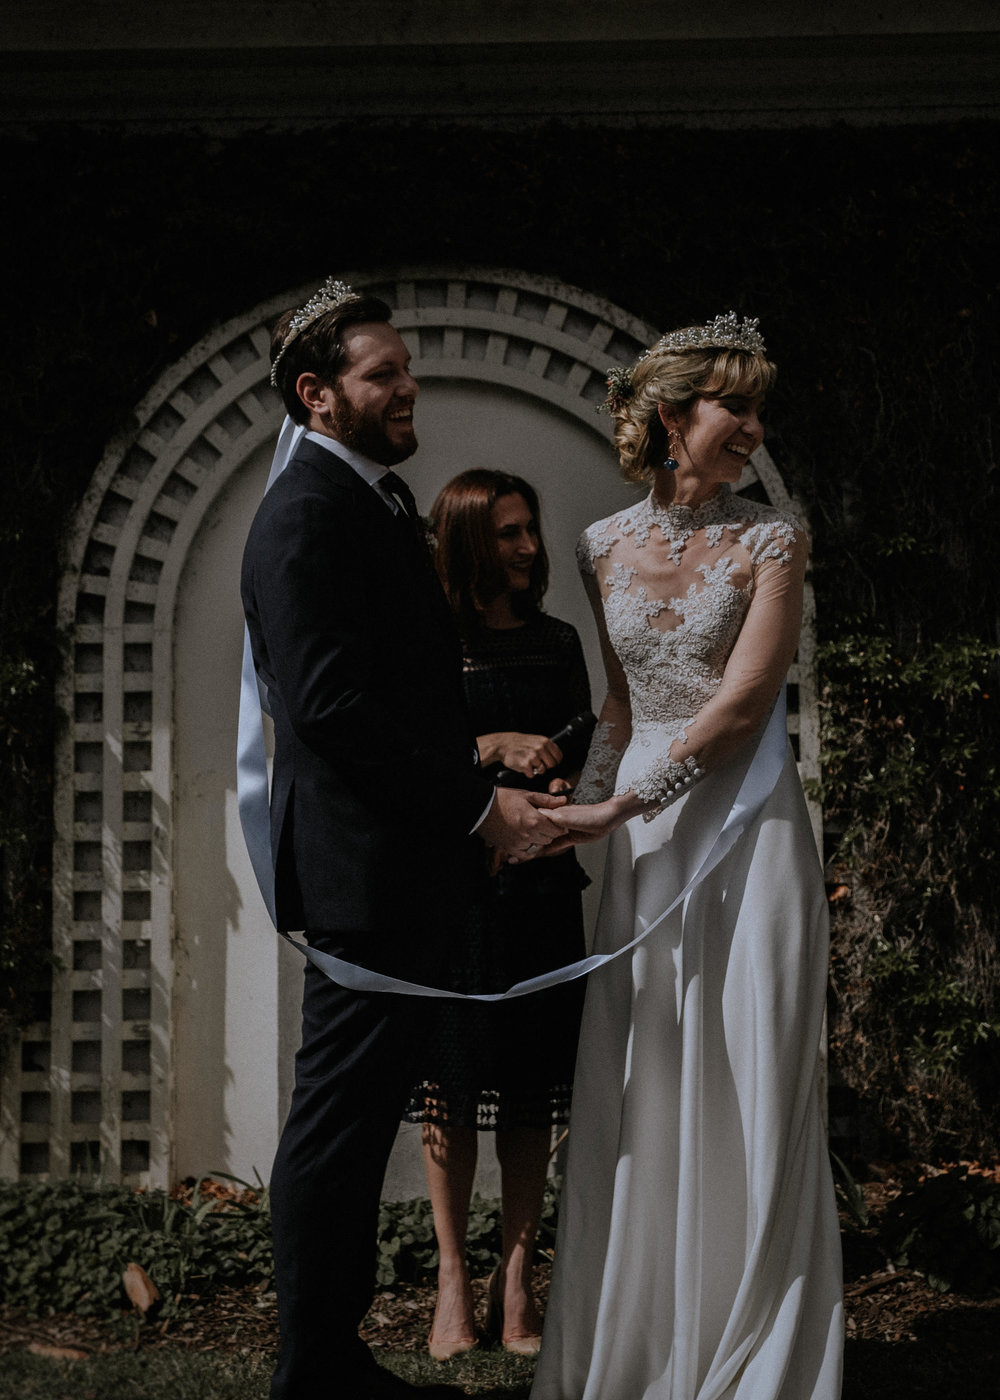 R+M_elopement wedding photography_kings & thieves_blog (159 of 326).jpg